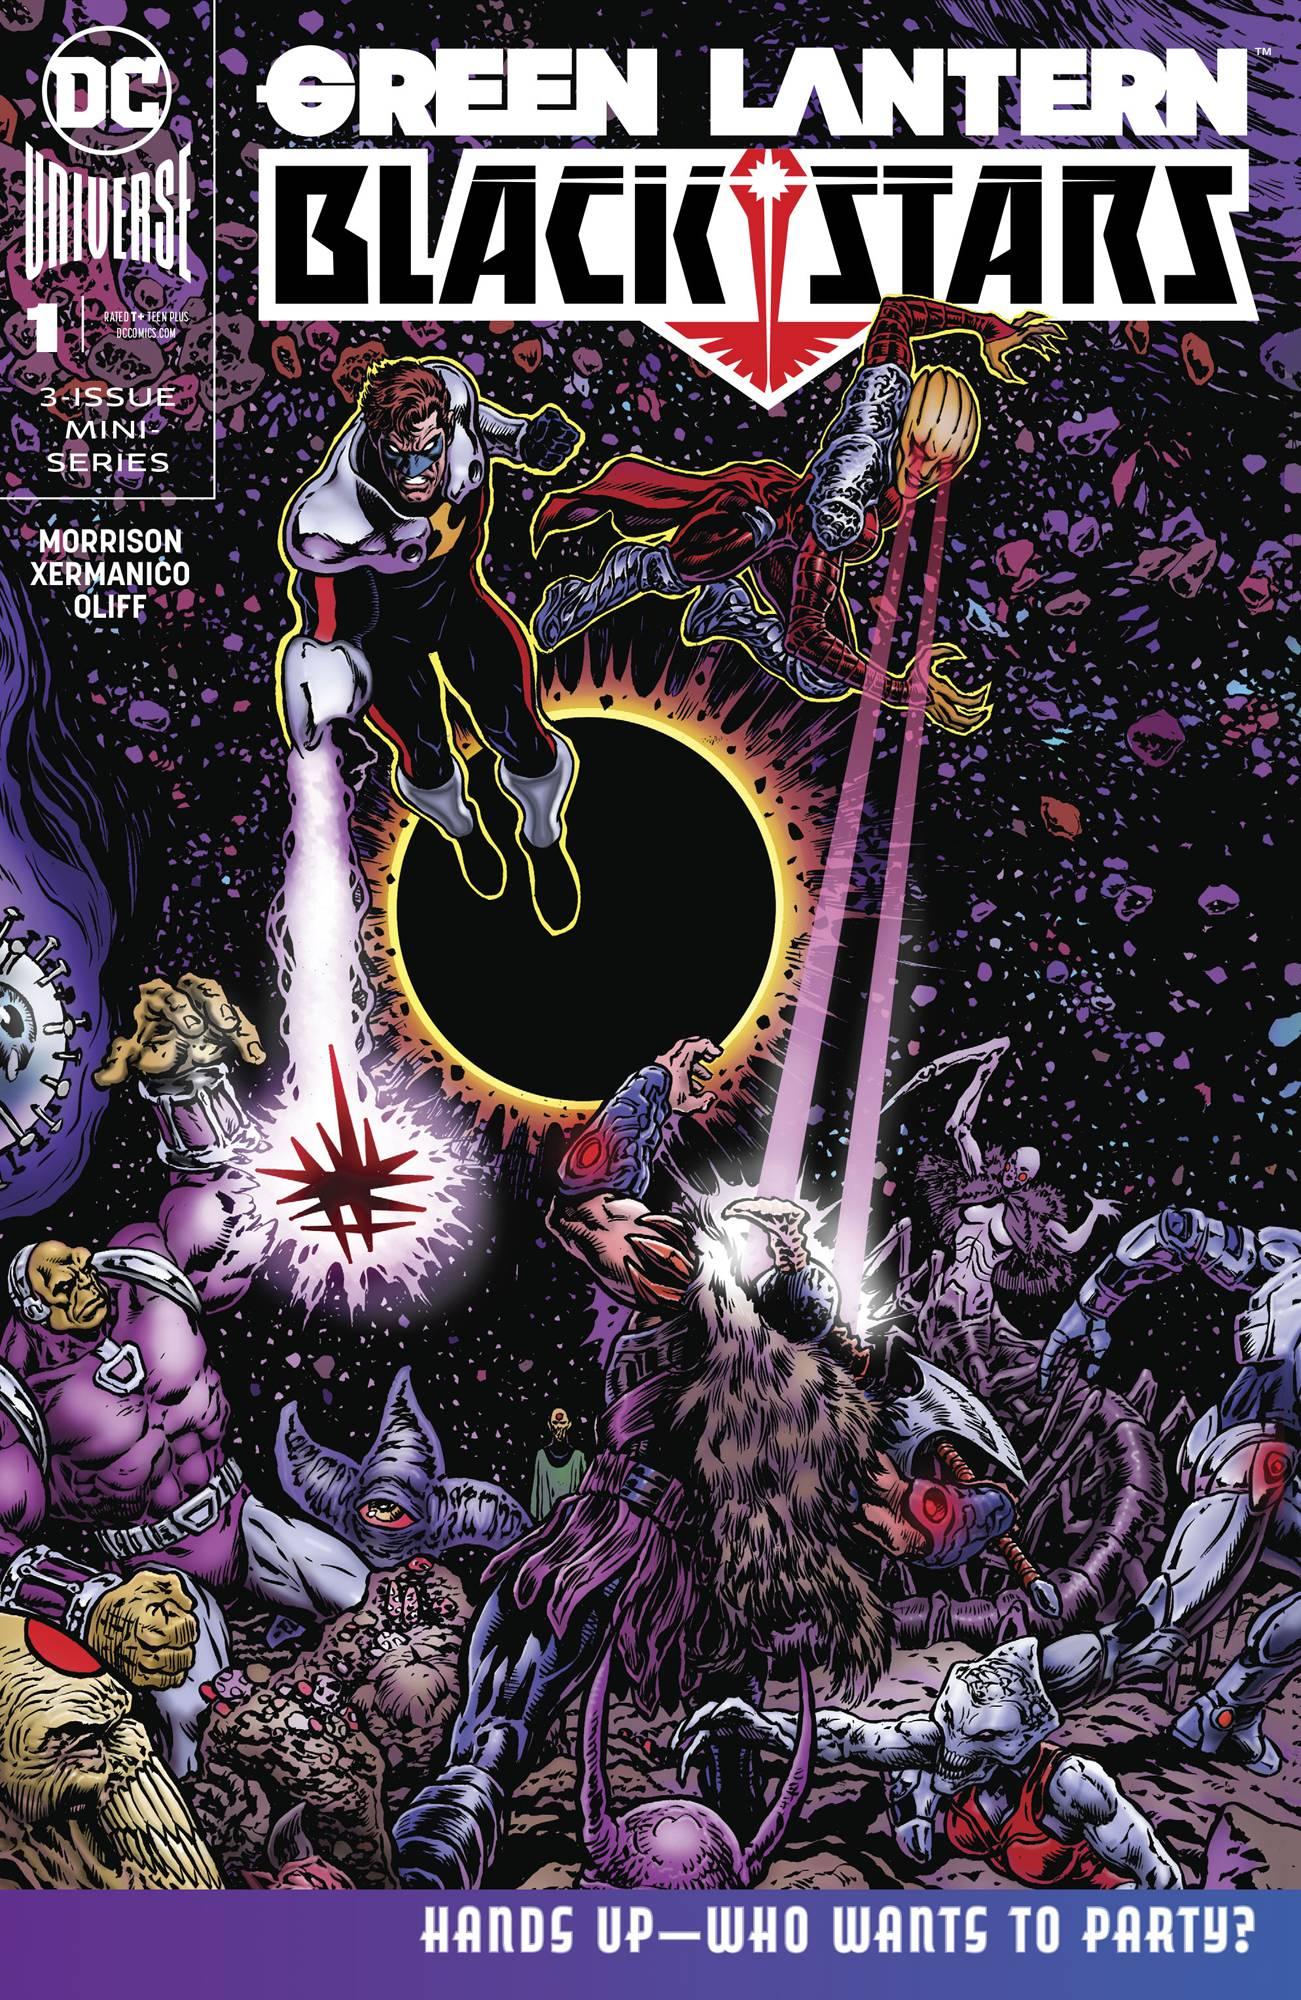 Green Lantern: Blackstars #1 (2019)